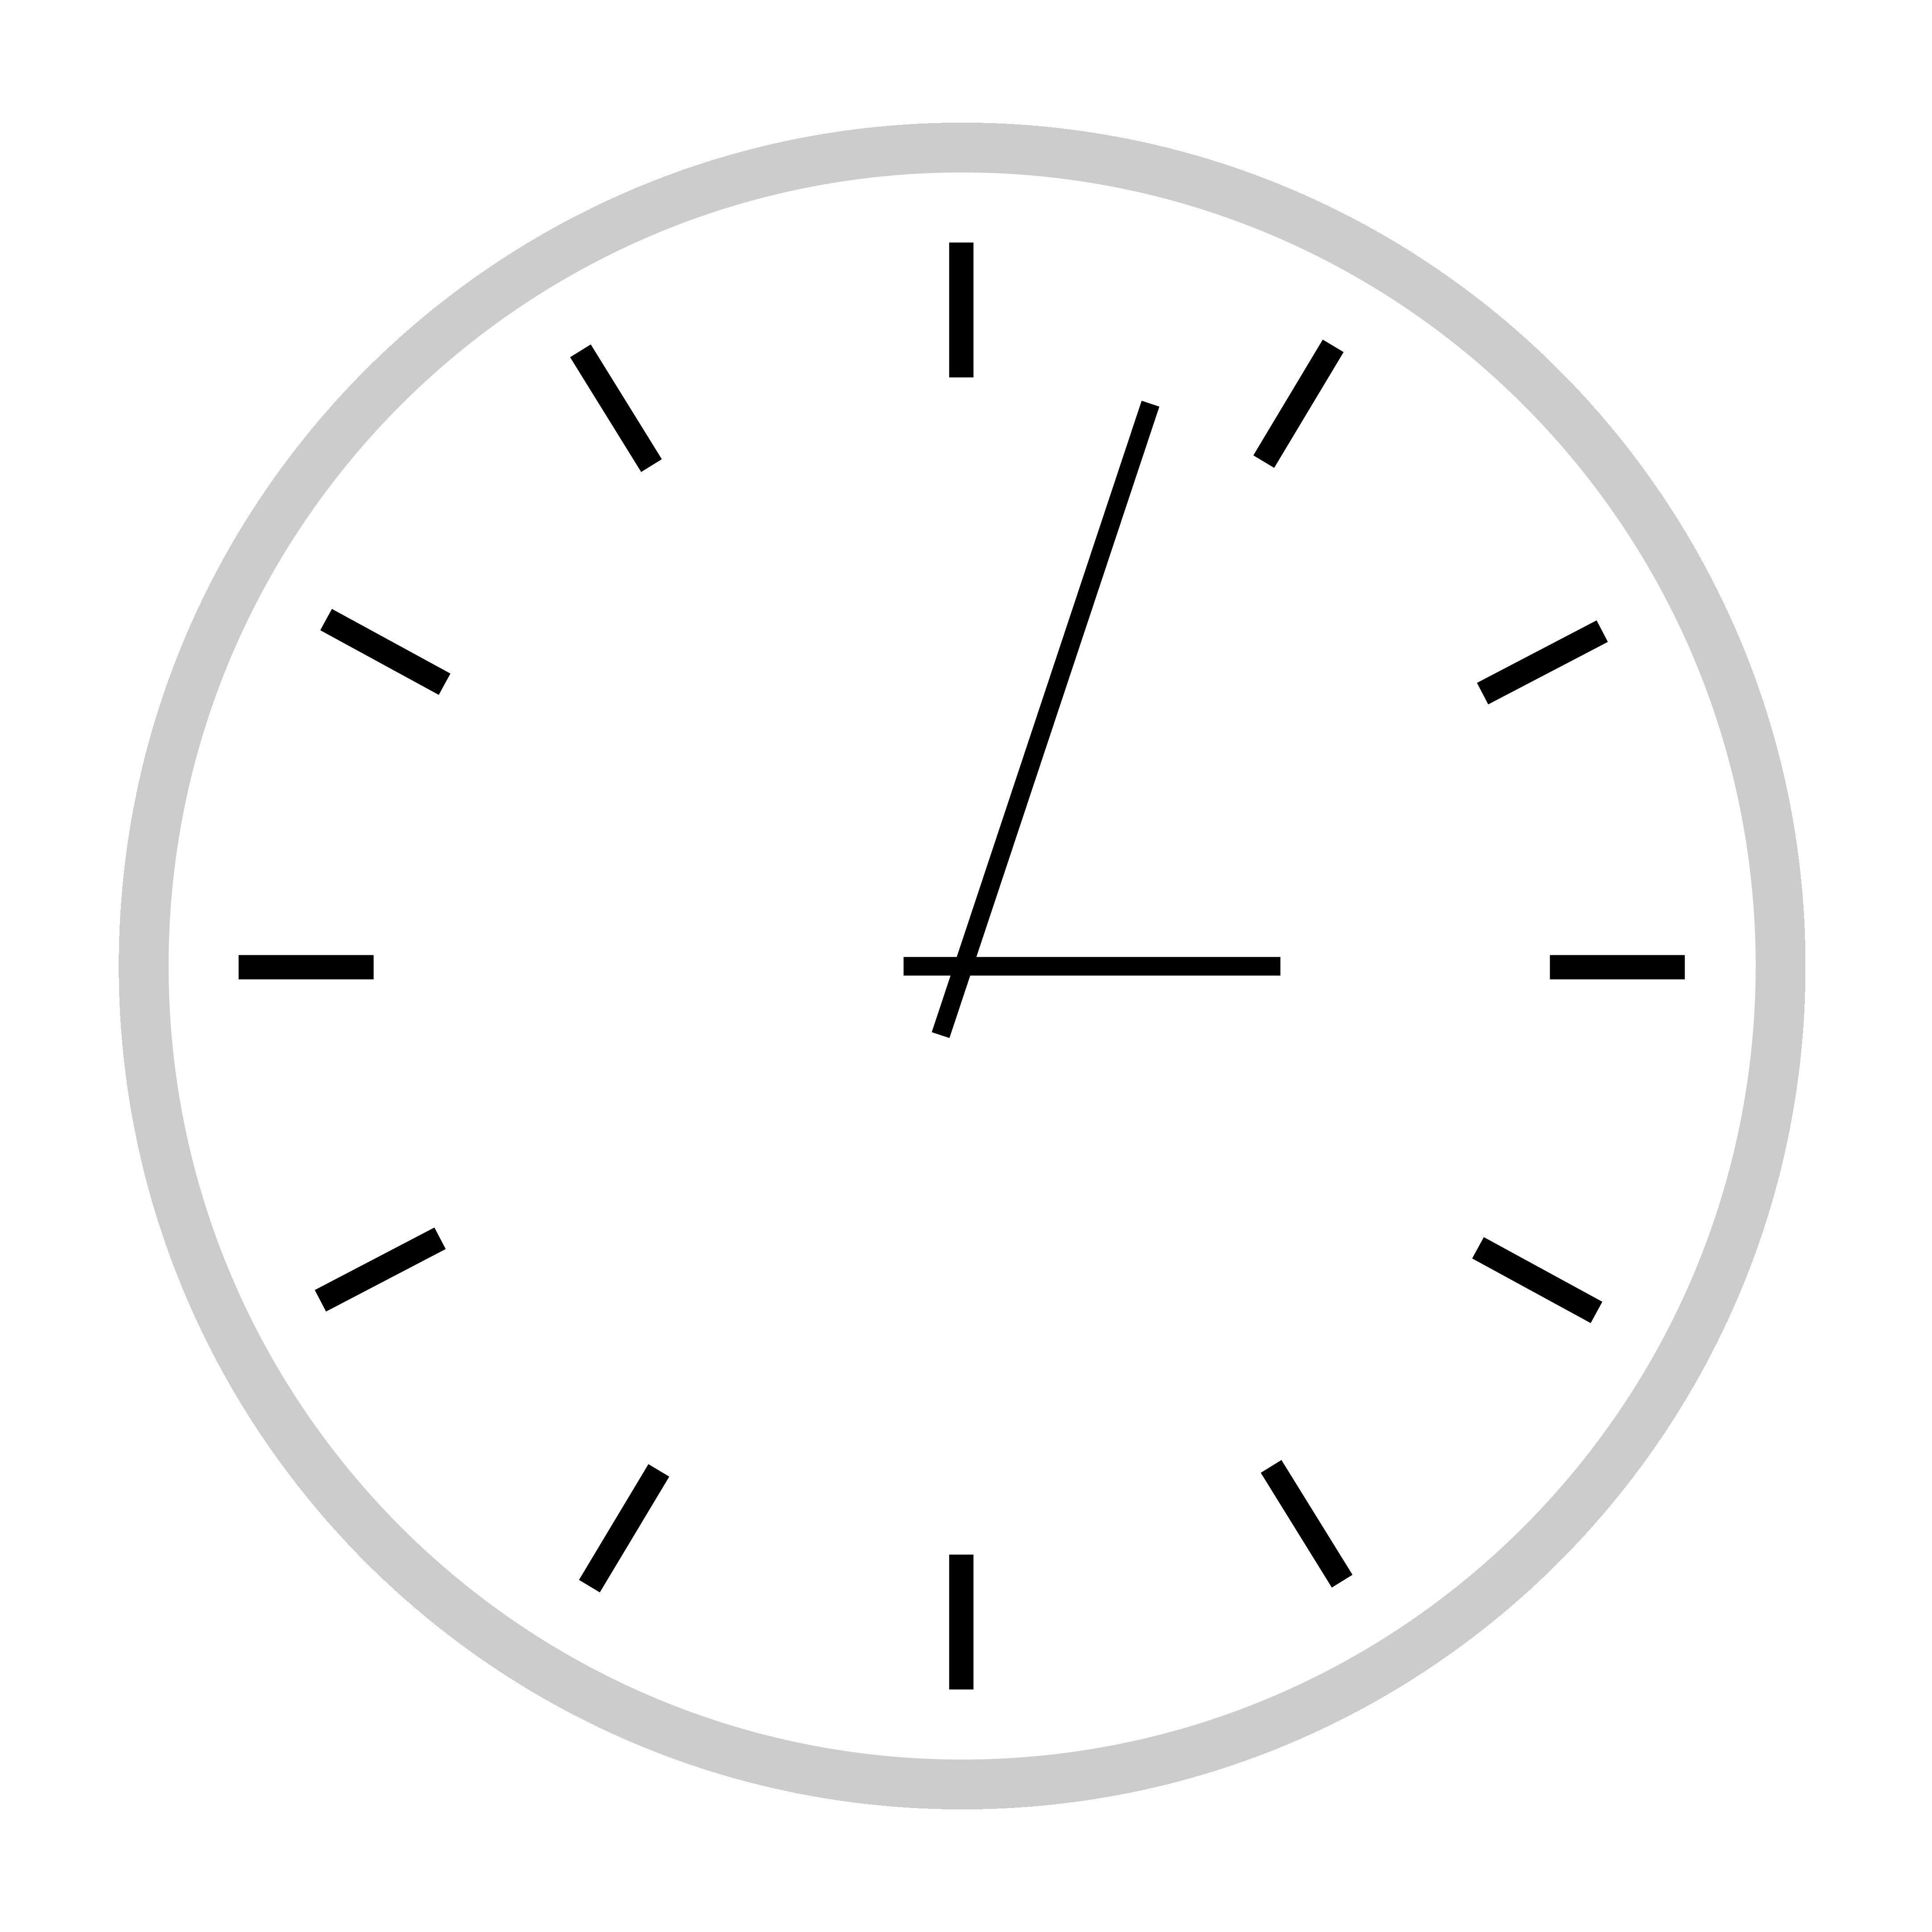 Clocks-Time-02.png